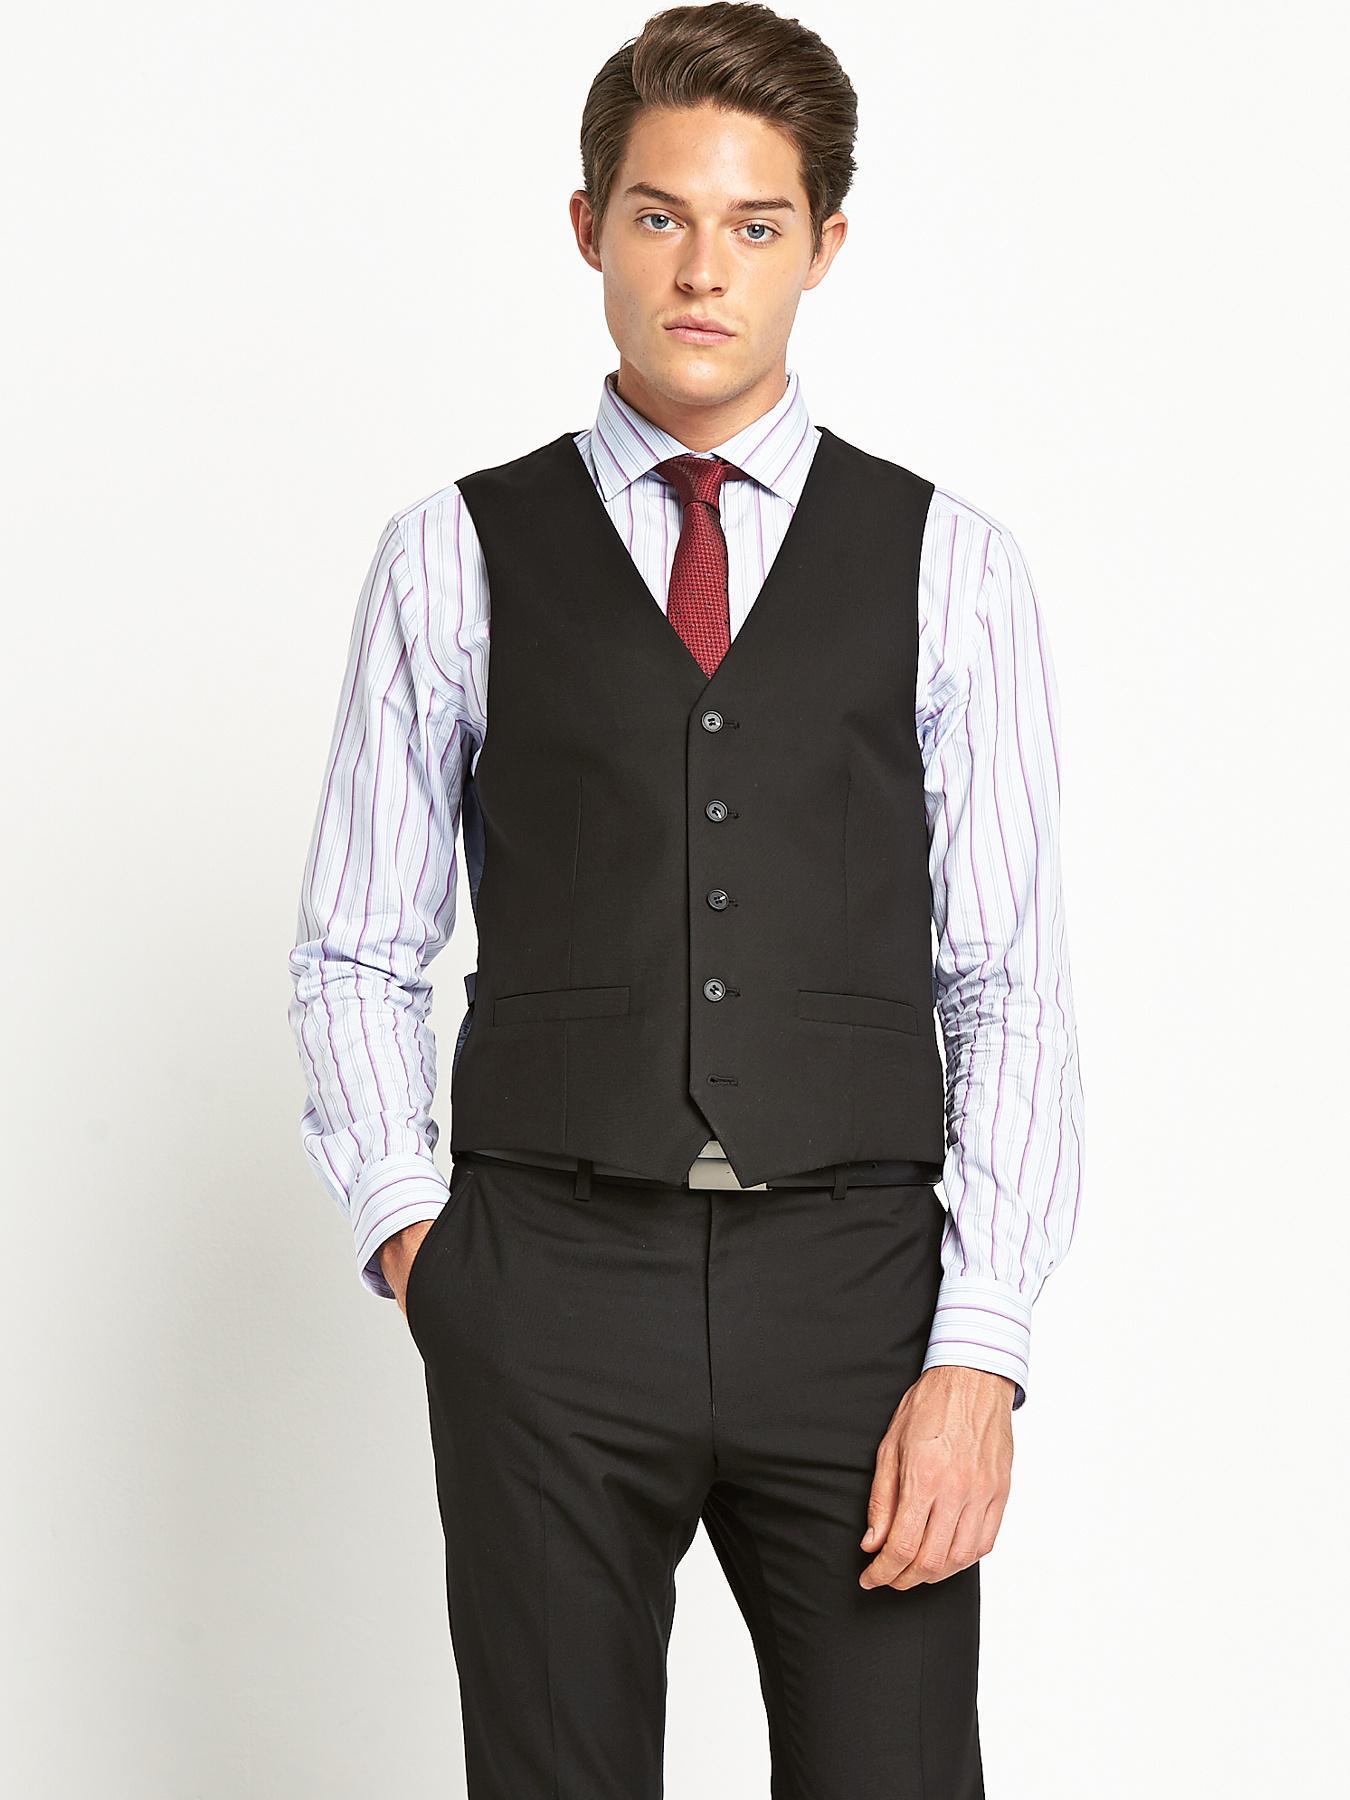 Mens Slim Fit PV Suit Waistcoat - Black, Black at Littlewoods